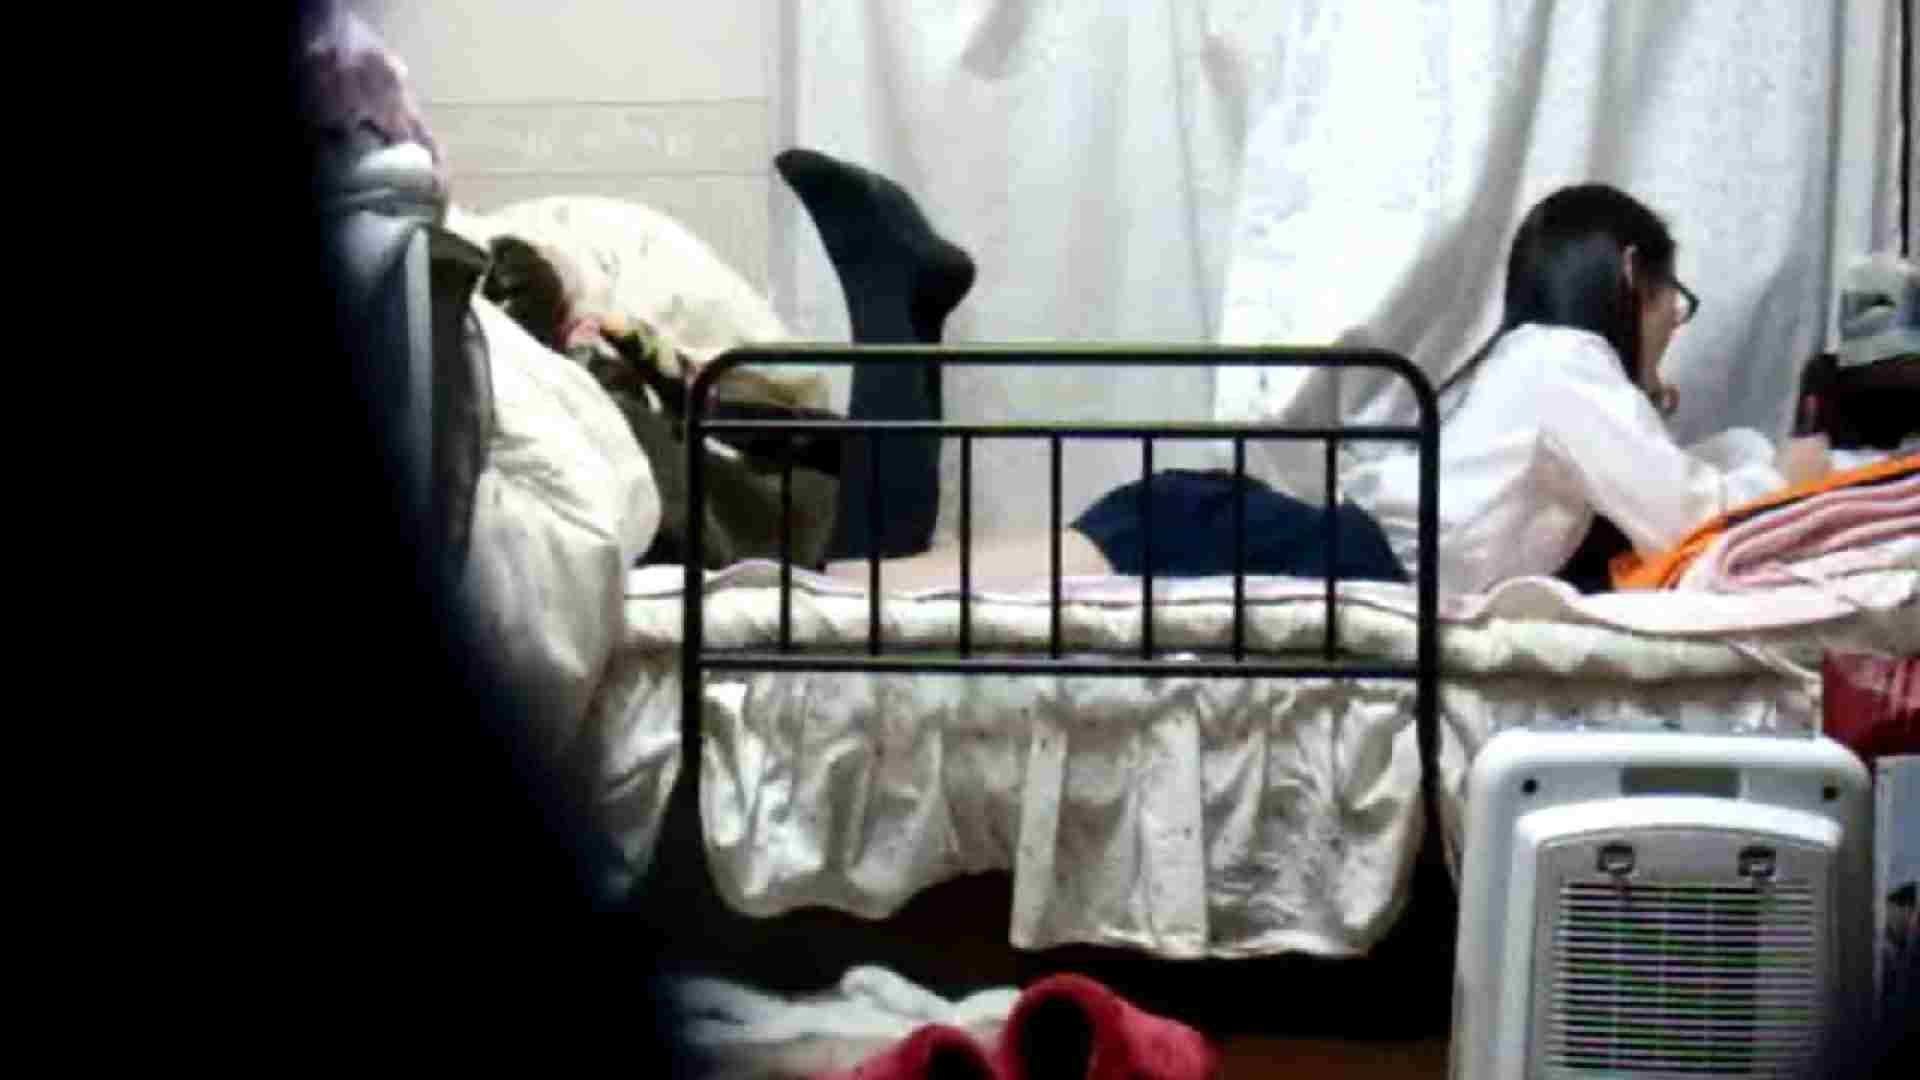 vol.4 まどかの帰宅後の部屋、ベッドで何かが始まります。 ○族 ヌード画像 100画像 3